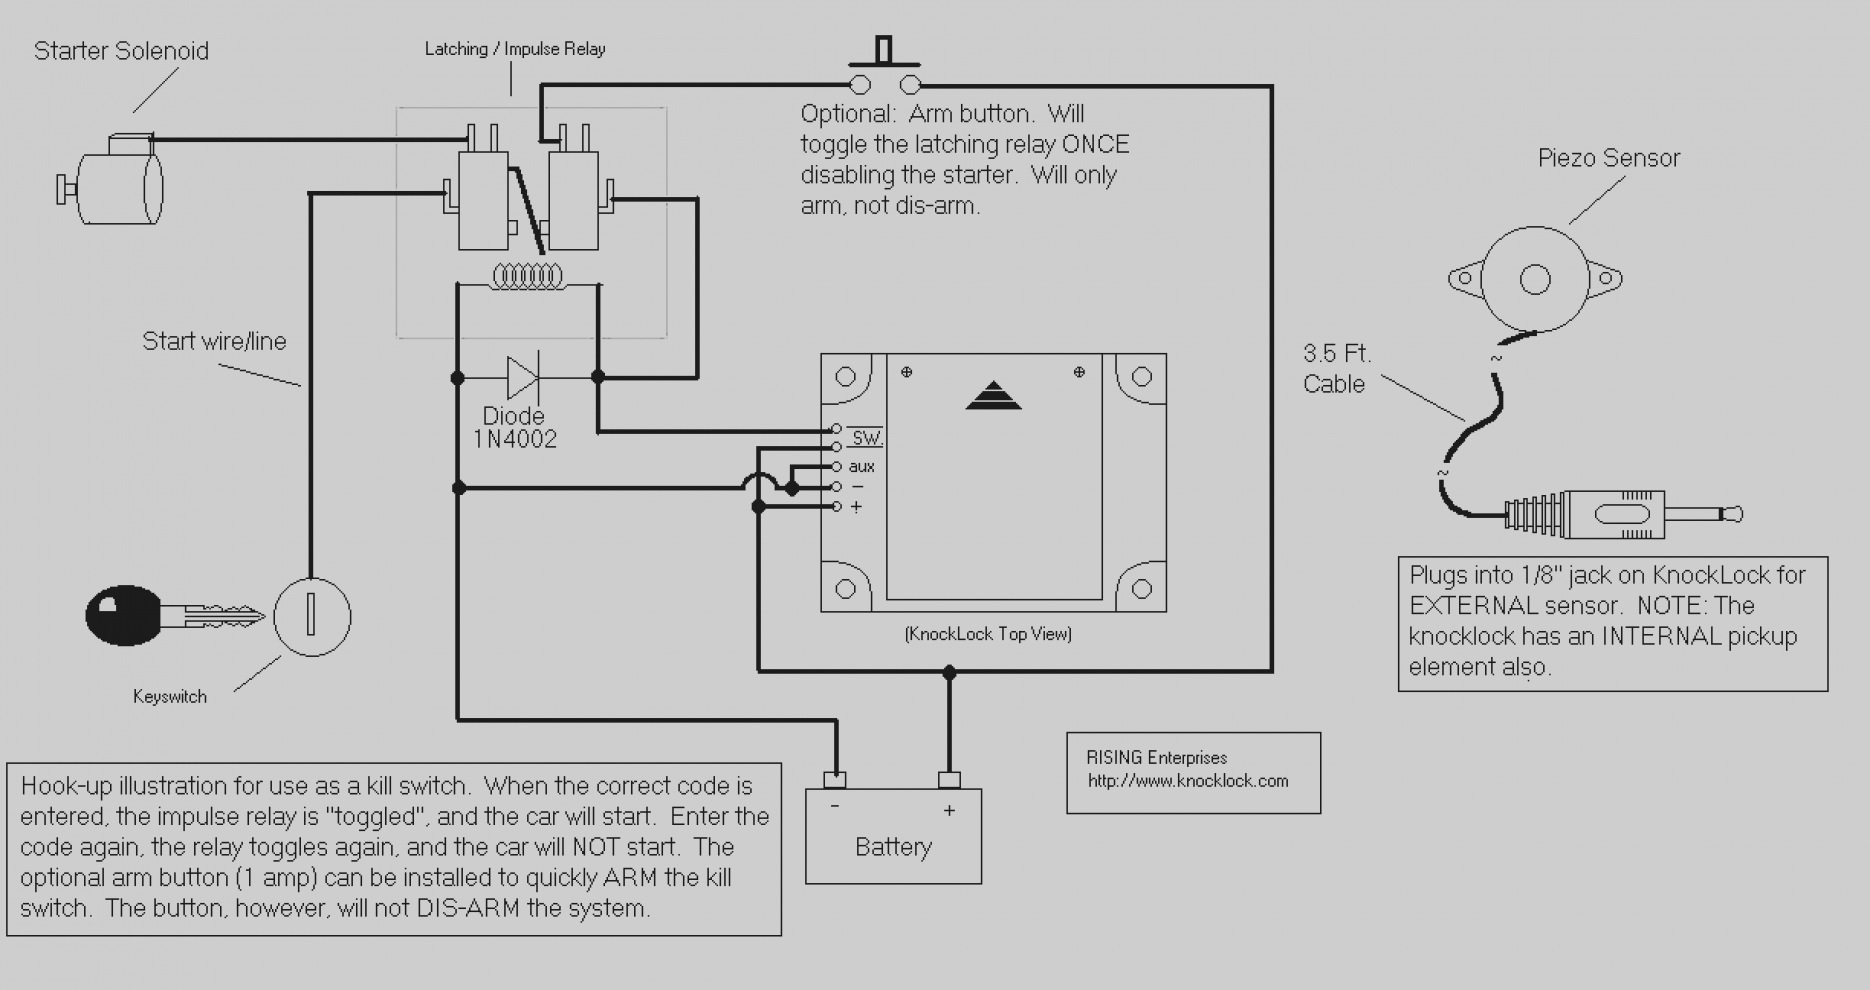 3 Car Garage Wiring Diagram Schematic Diagrams Entertainment Center Door Opener Sample